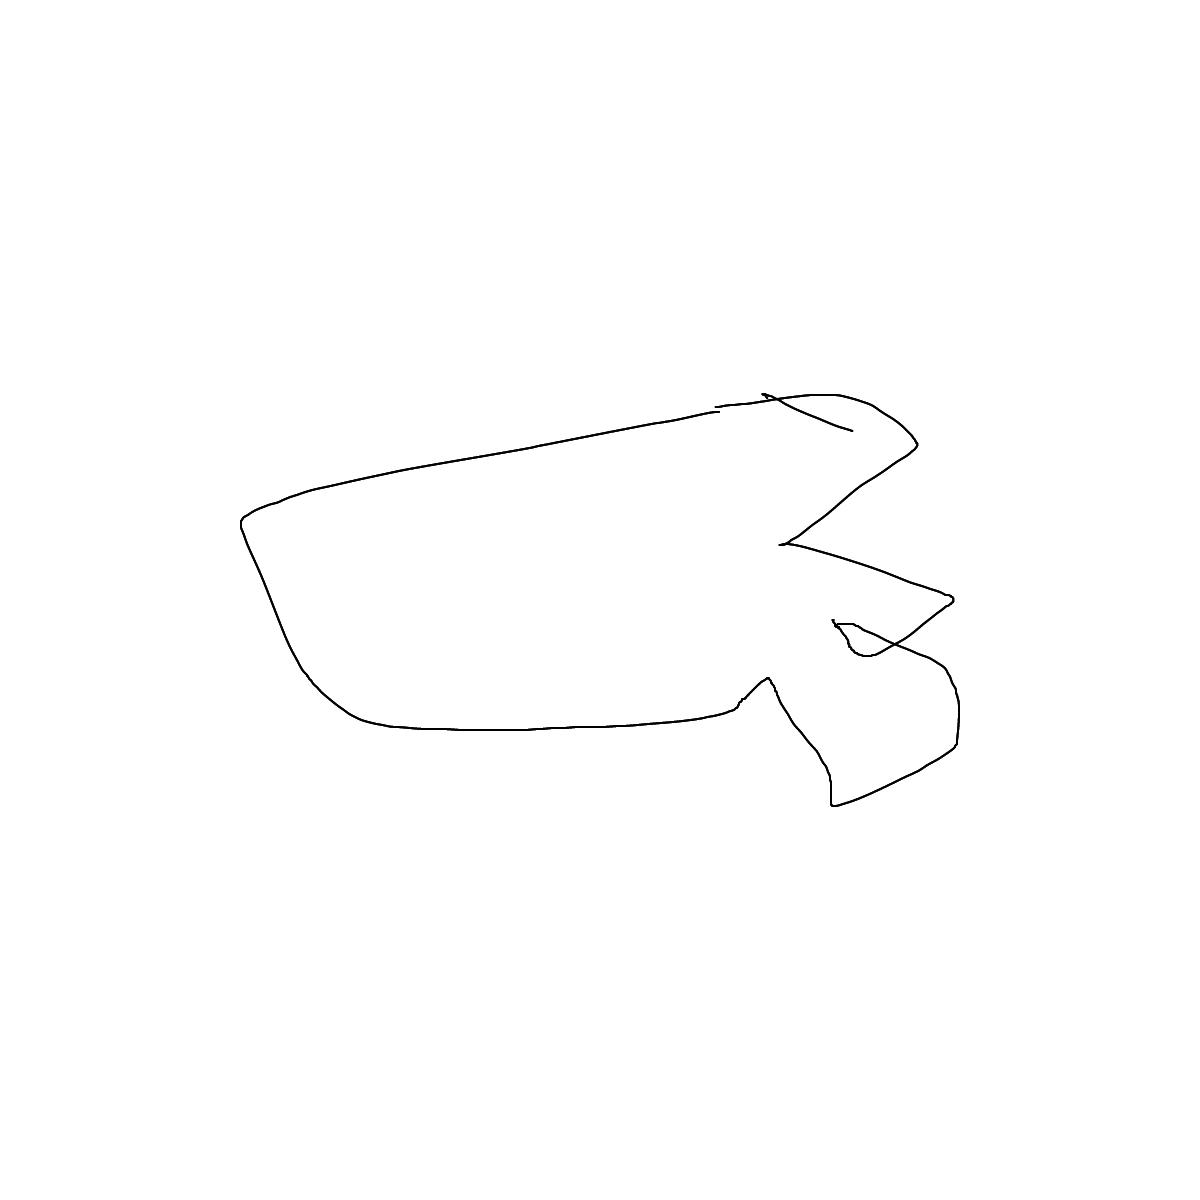 BAAAM drawing#236 lat:40.7132034301757800lng: -74.0122680664062500